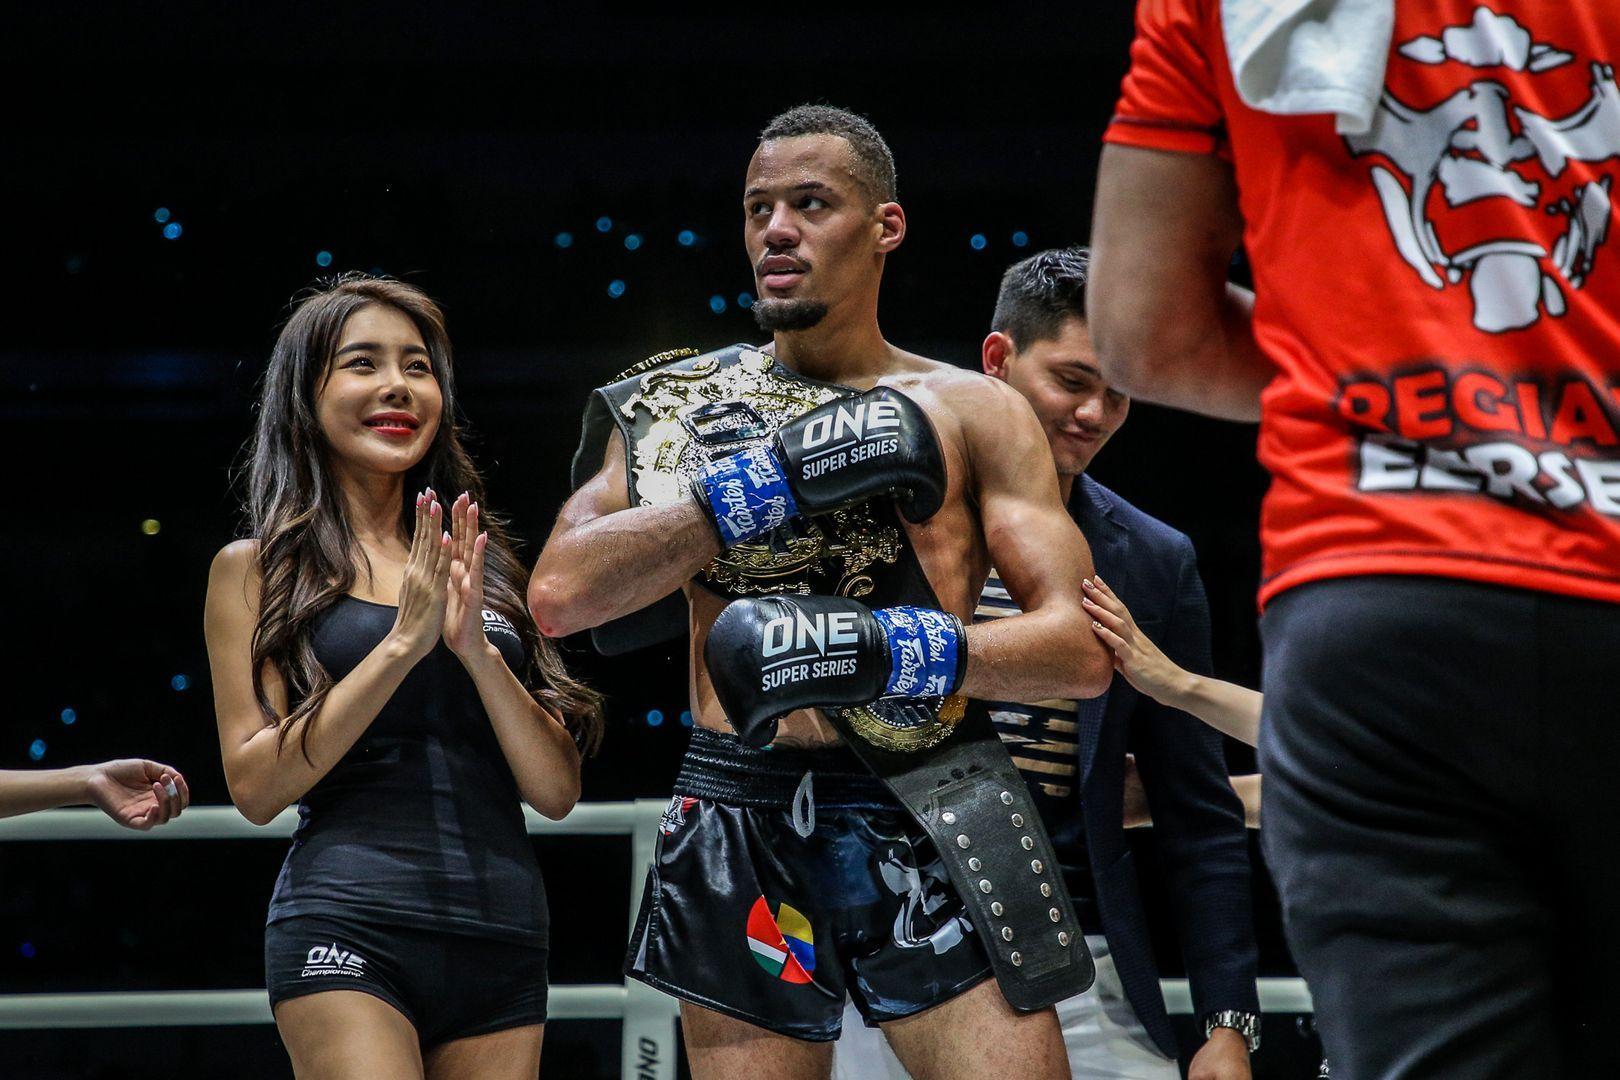 Regian Eersel holds the ONE Lightweight Kickboxing World Title belt